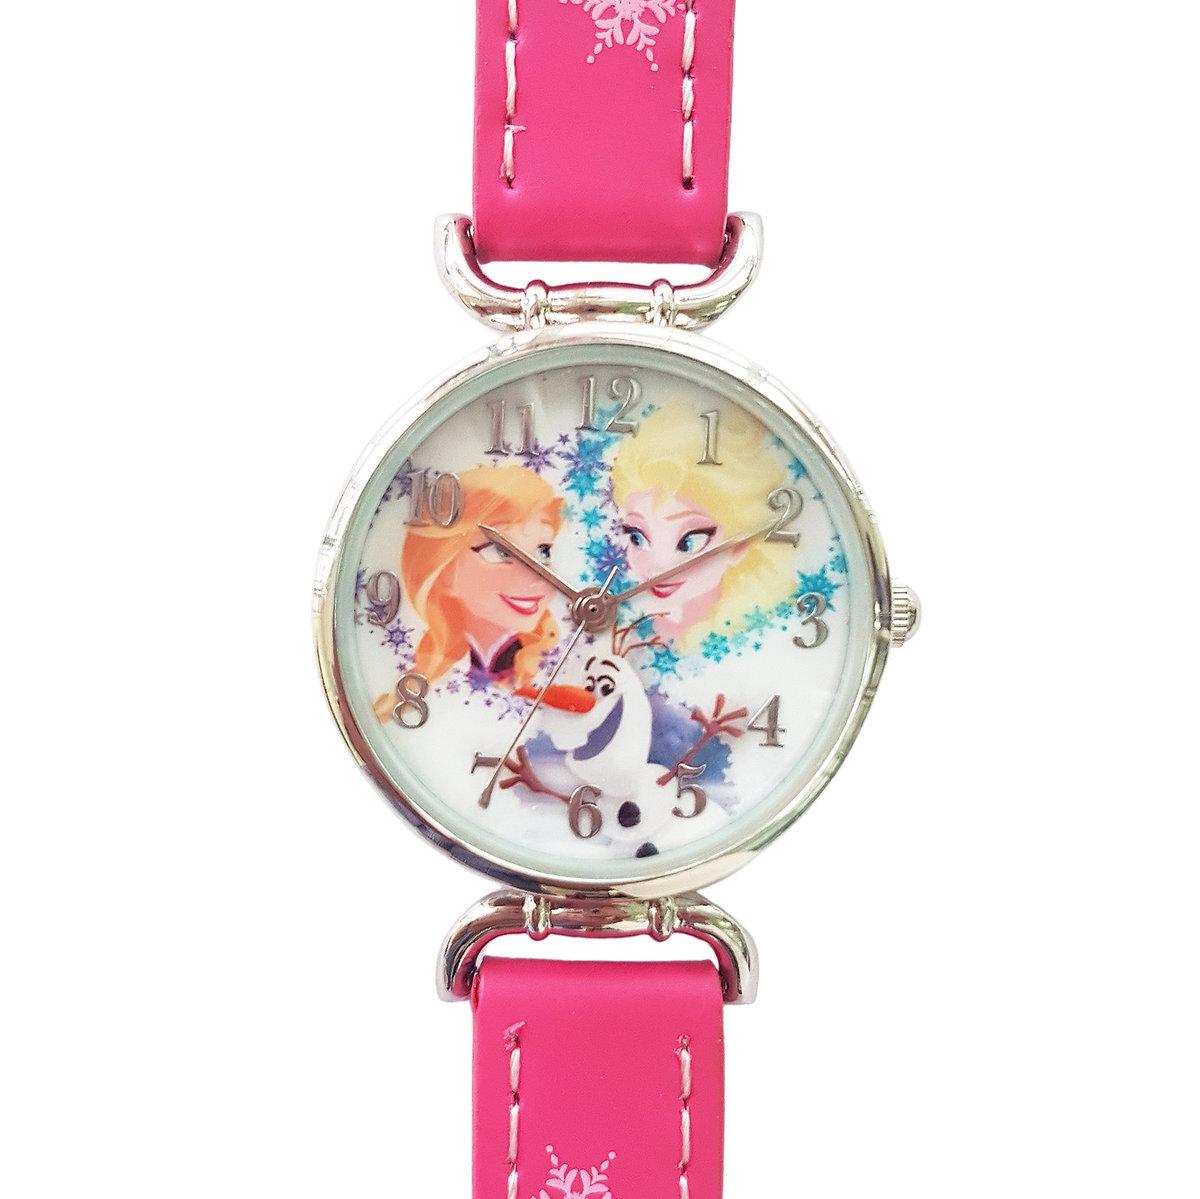 DISNEY FROZEN - Kids wrist watch - Fuchsia color (Licensed by Disney)